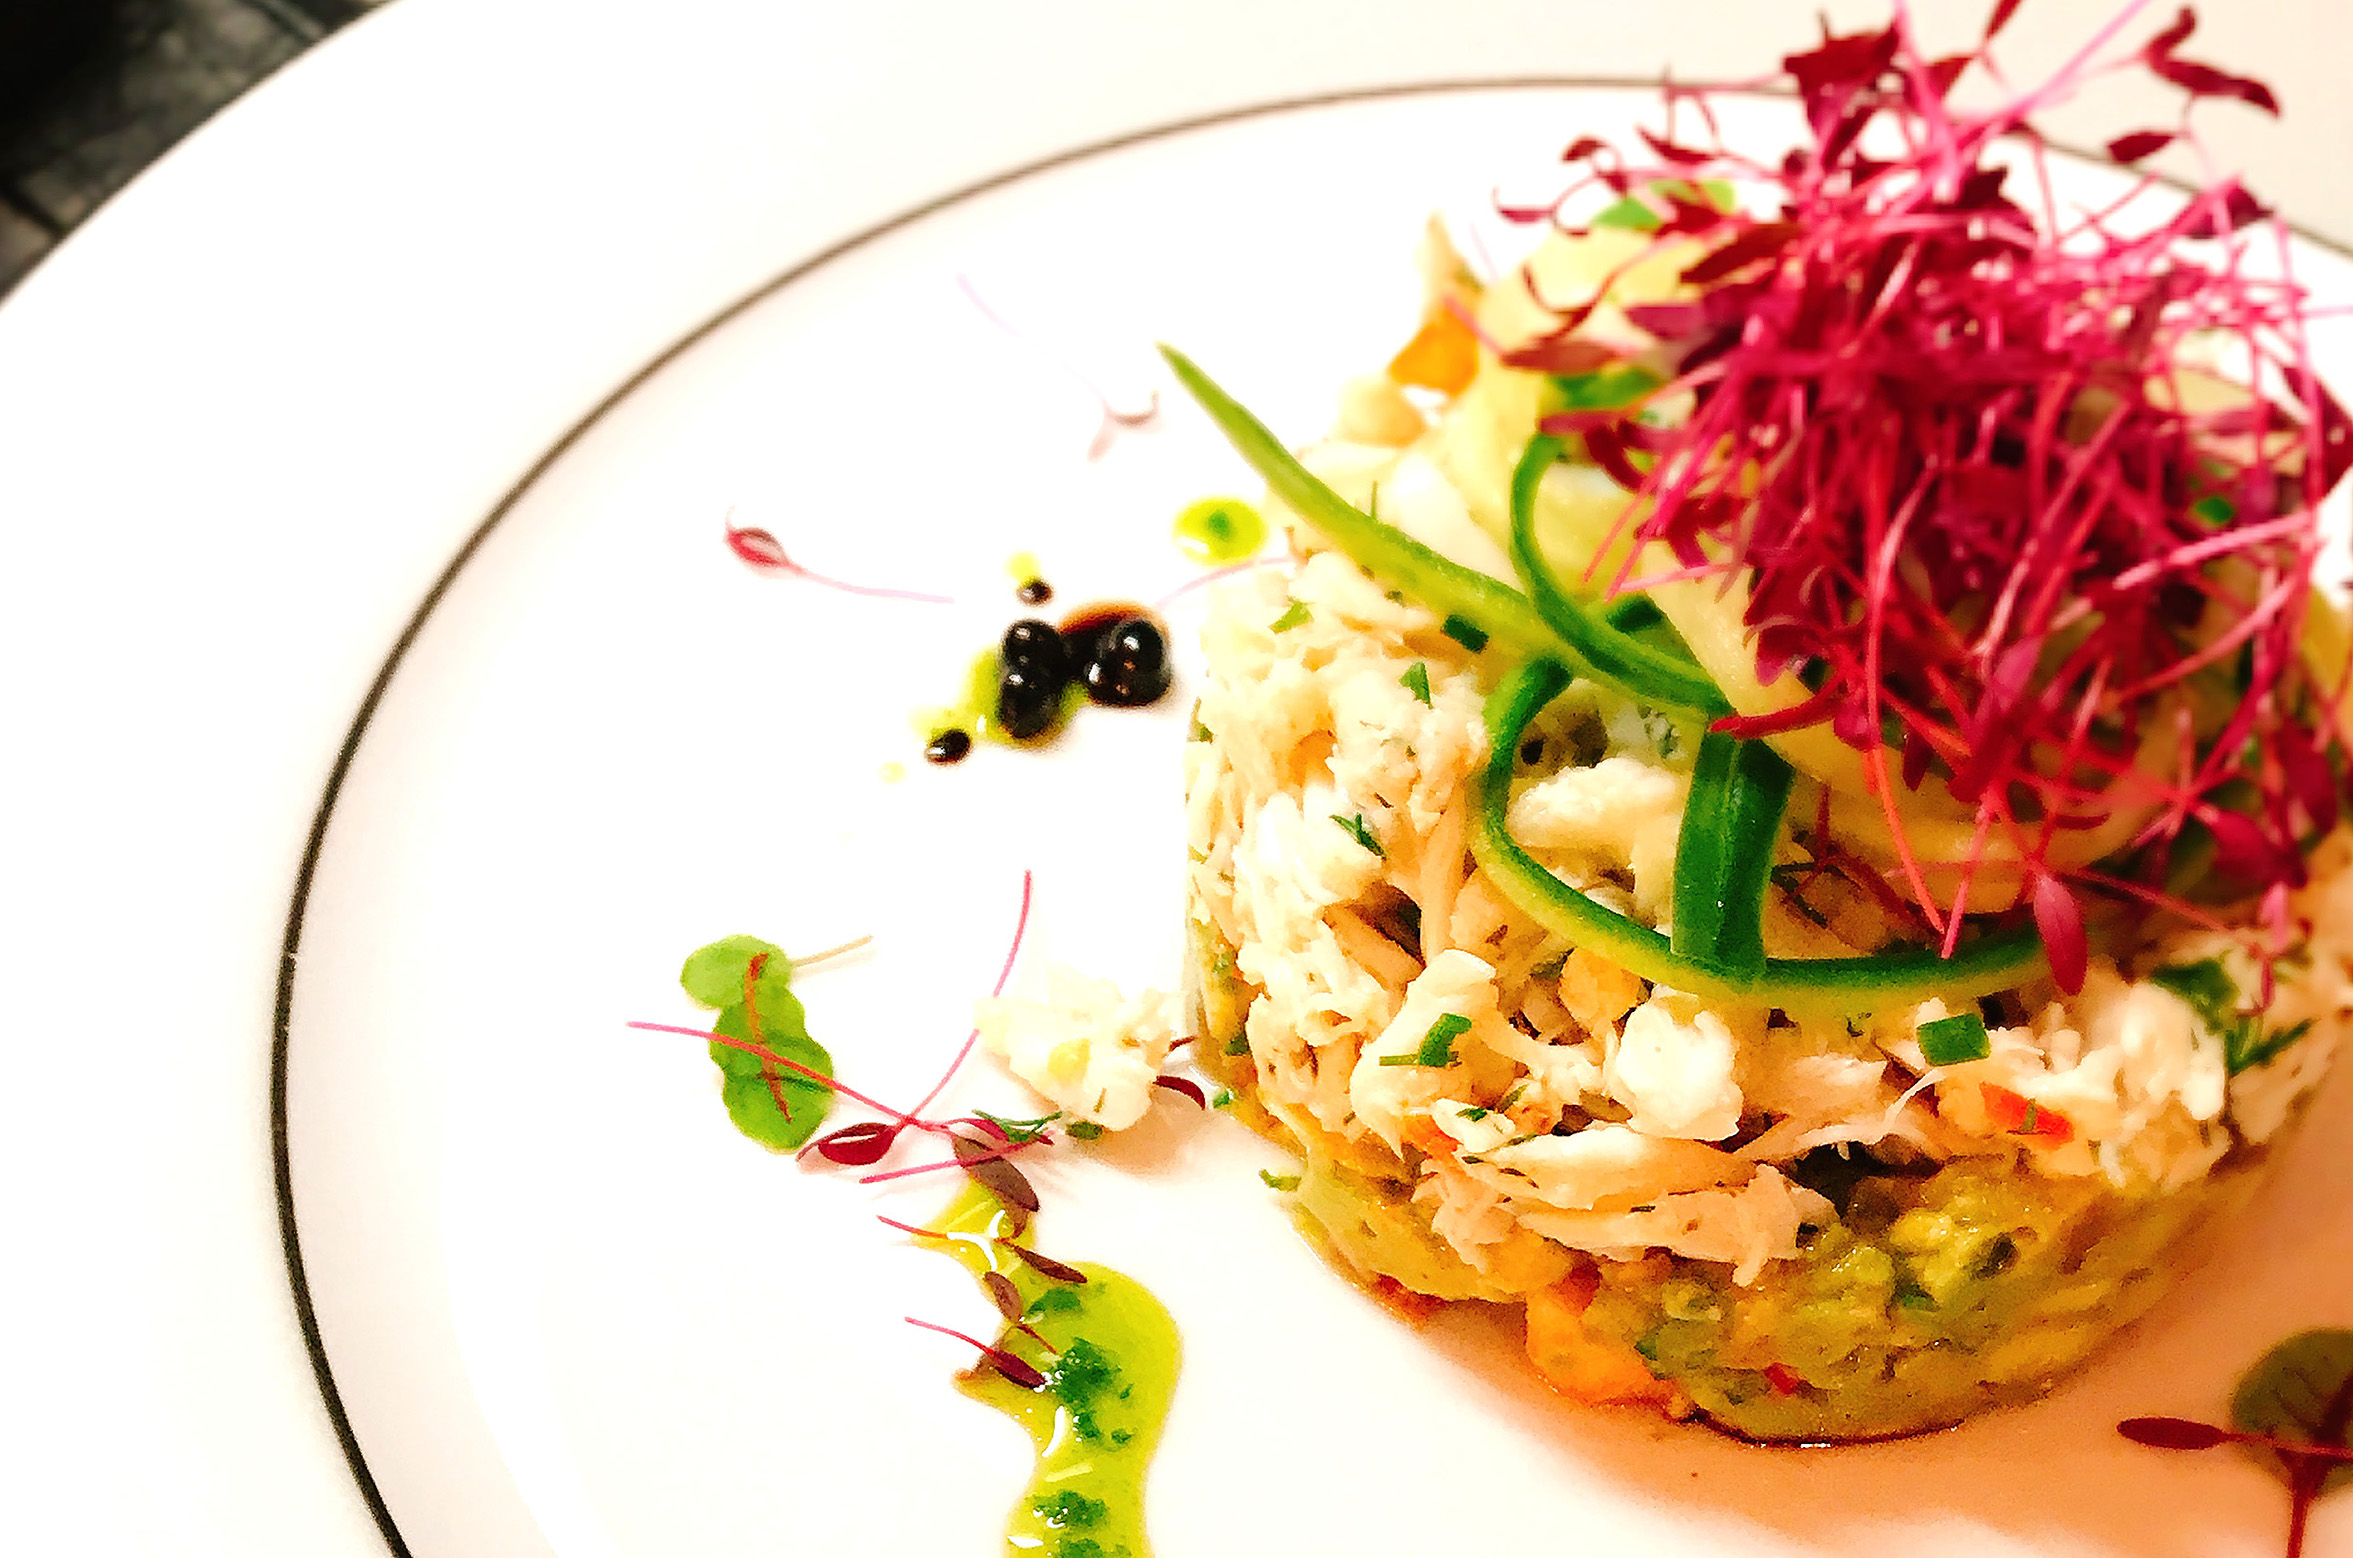 Culinary-Crab-Avocado-Chef-Tasia-Haag7.jpg